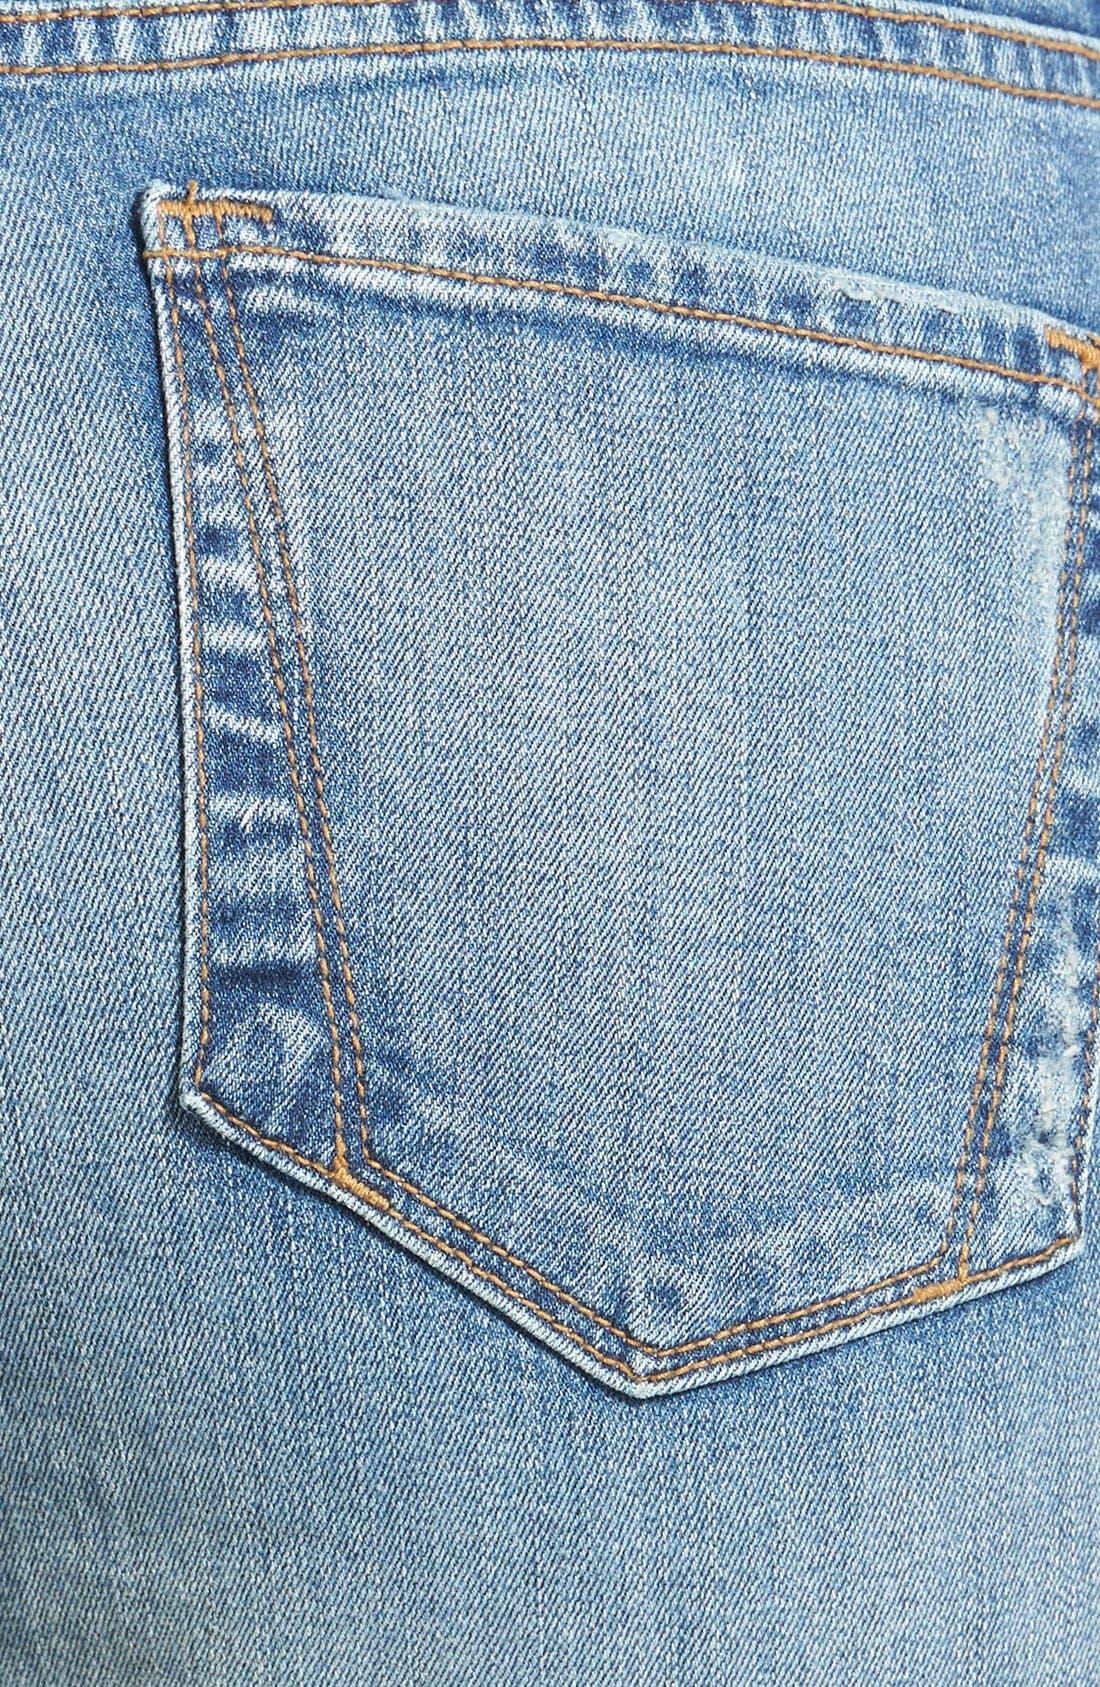 Alternate Image 3  - NYDJ 'Anabelle' Distressed Stretch Skinny Ankle Jeans (Lake Havasu) (Regular & Petite)